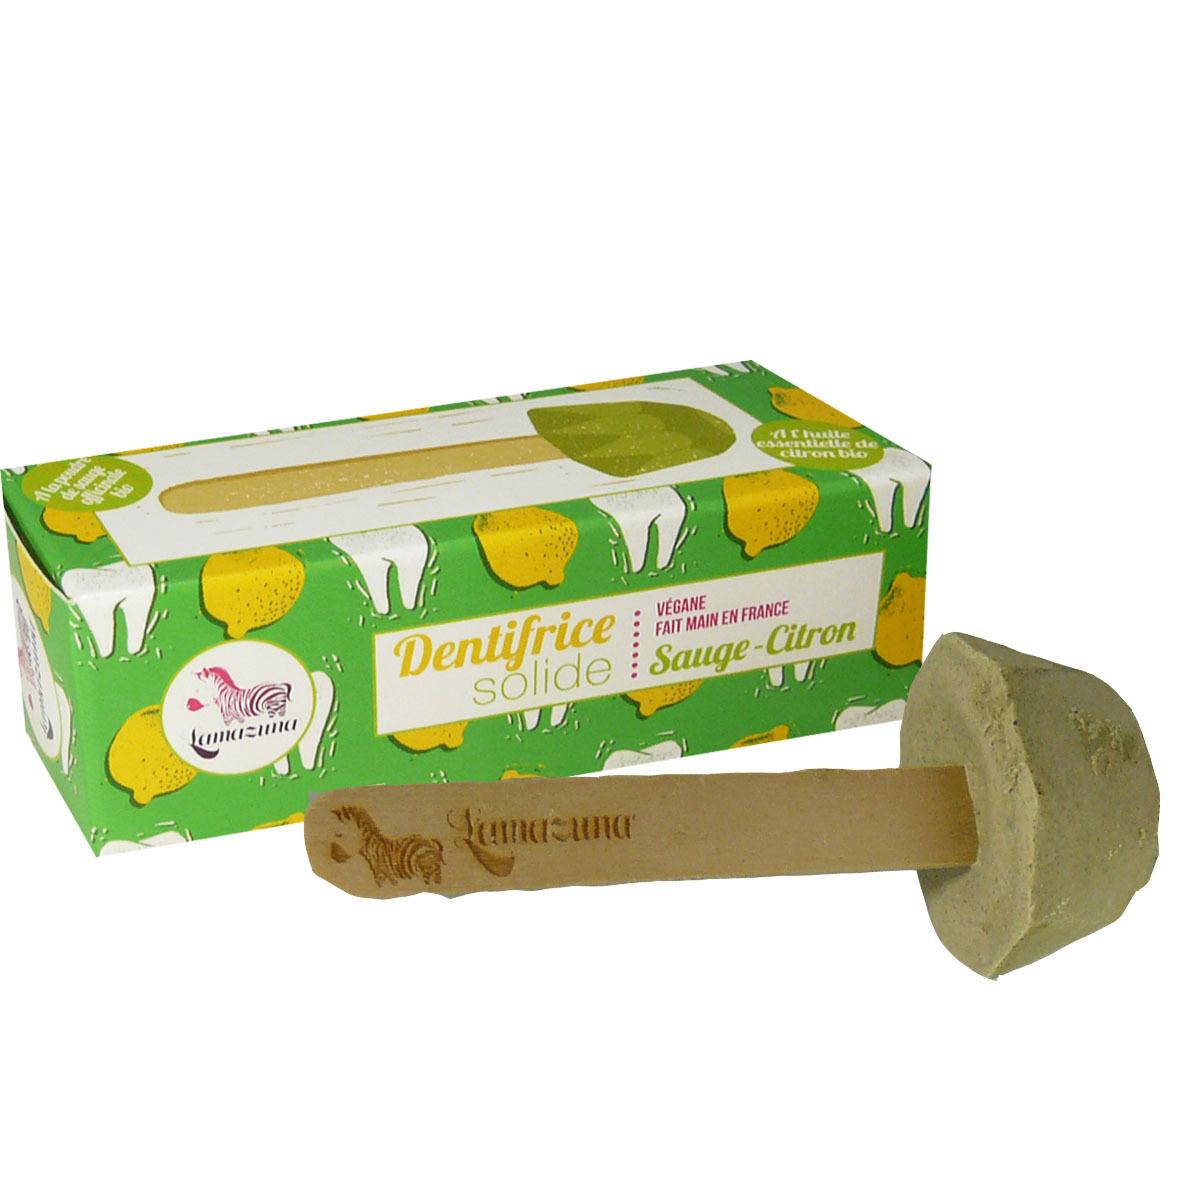 Lamazuna dentifrice solide sauge citron 17 g